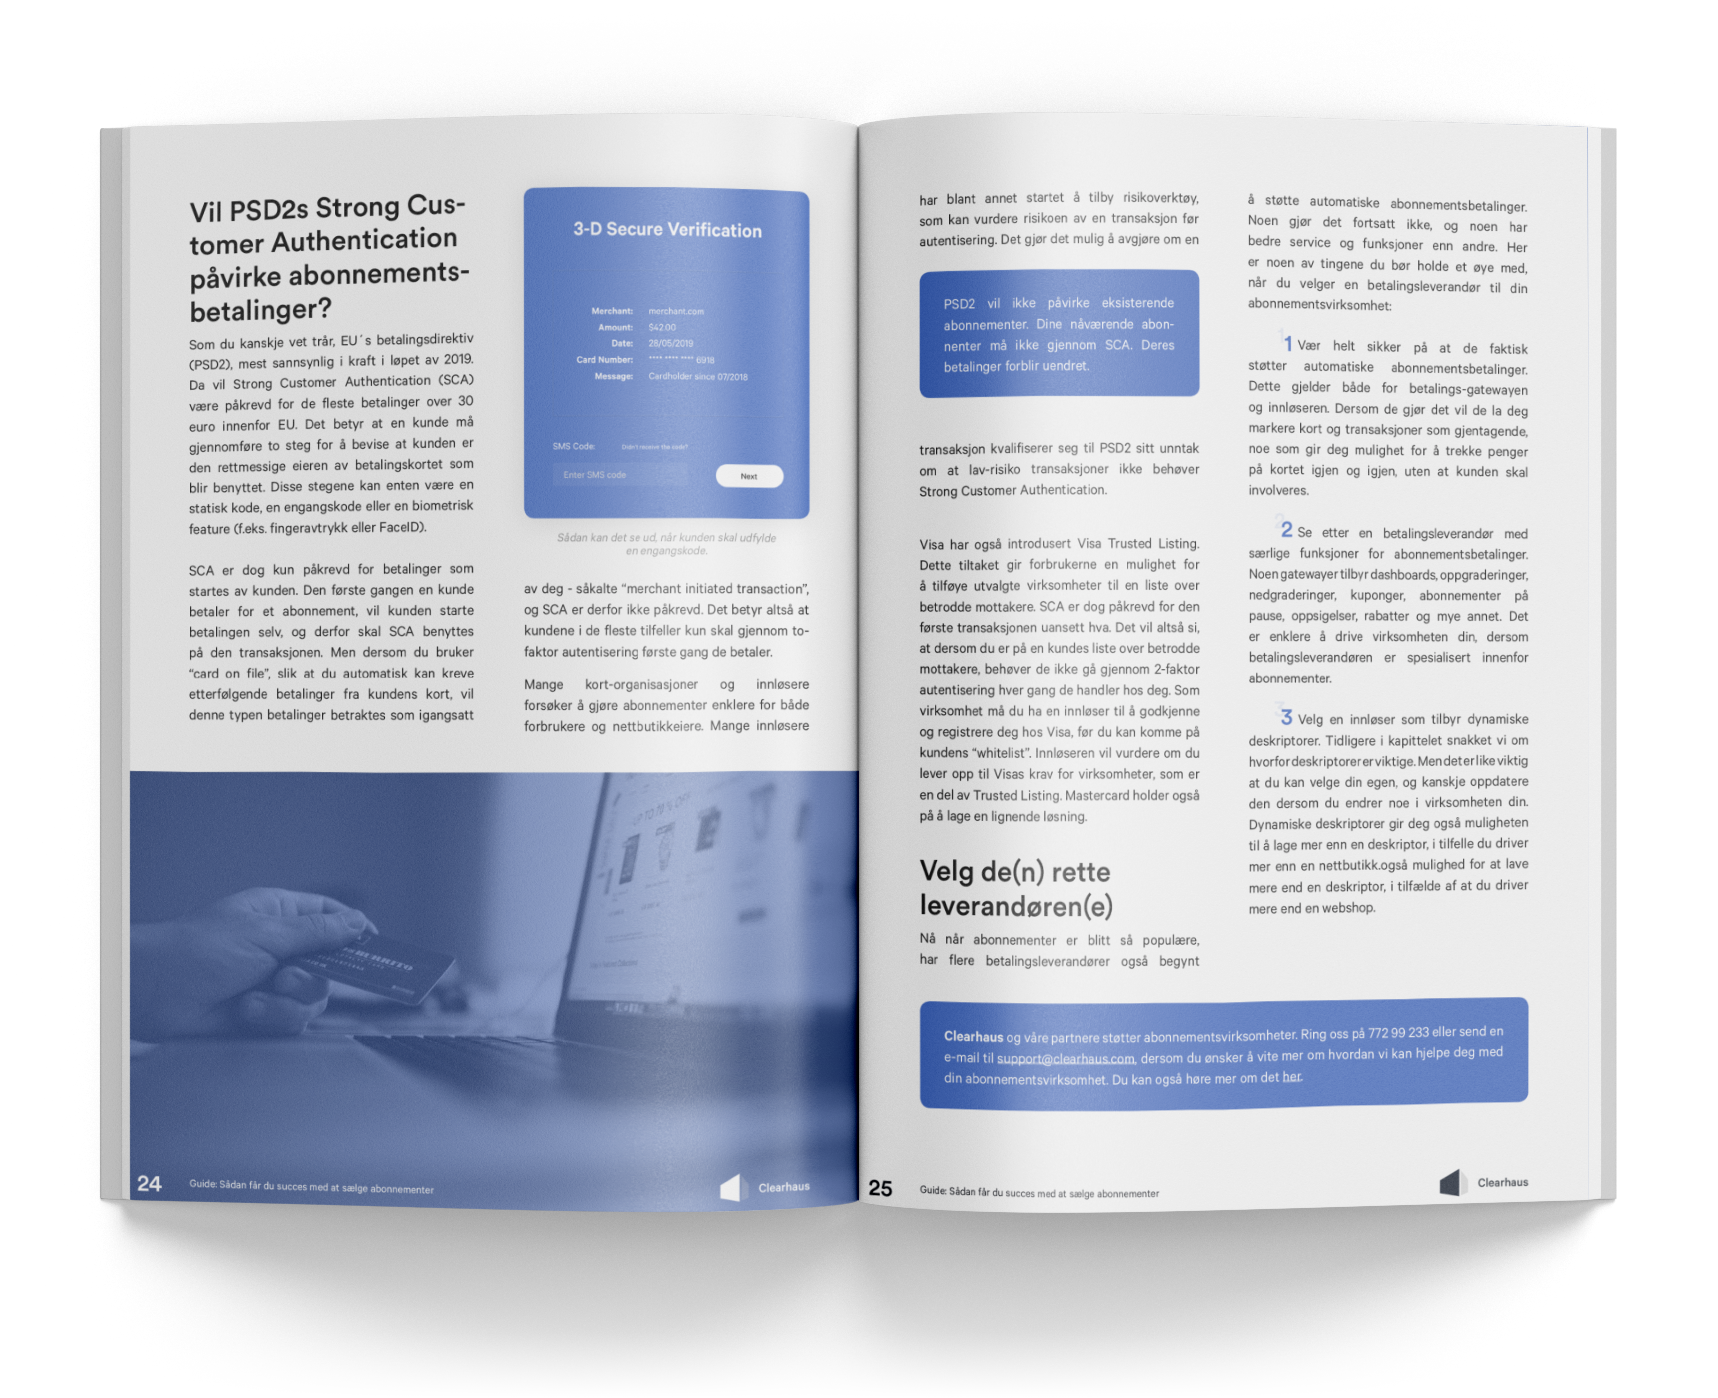 E-bok preview - pages 24 og 25